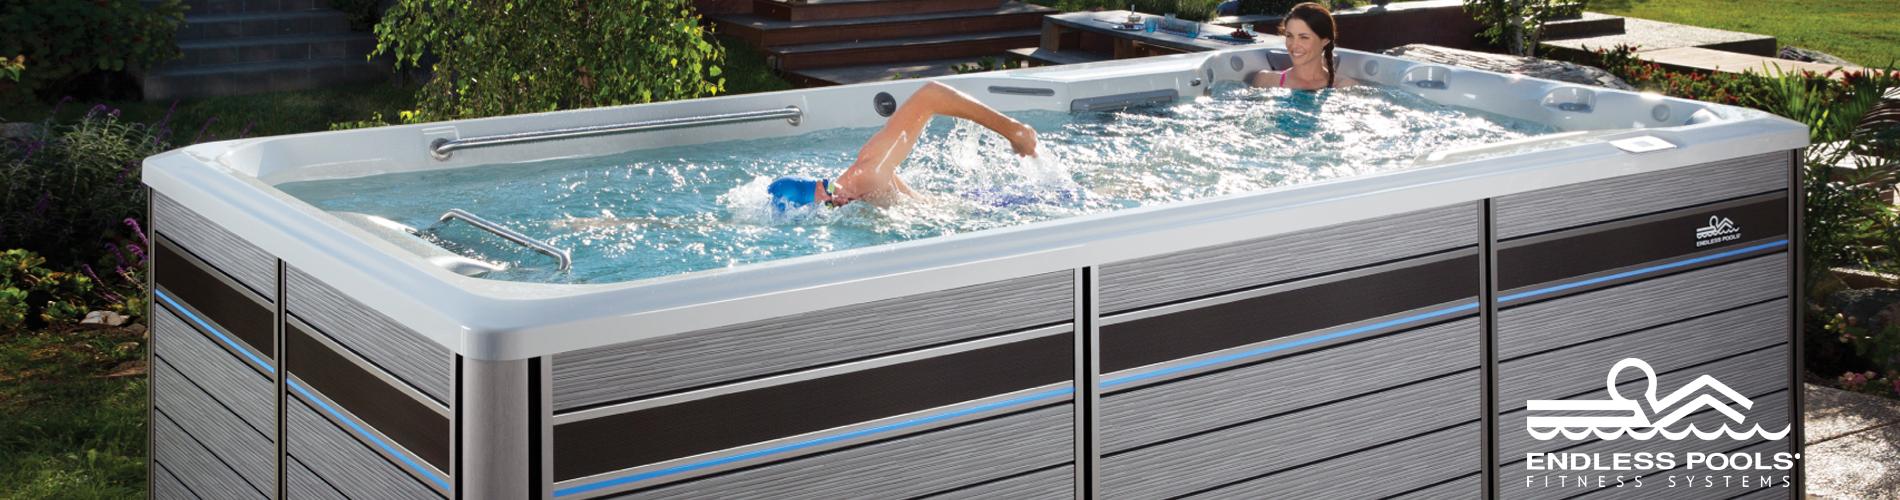 Ford Spa Pools Hot Spring Spas Tauranga Nz